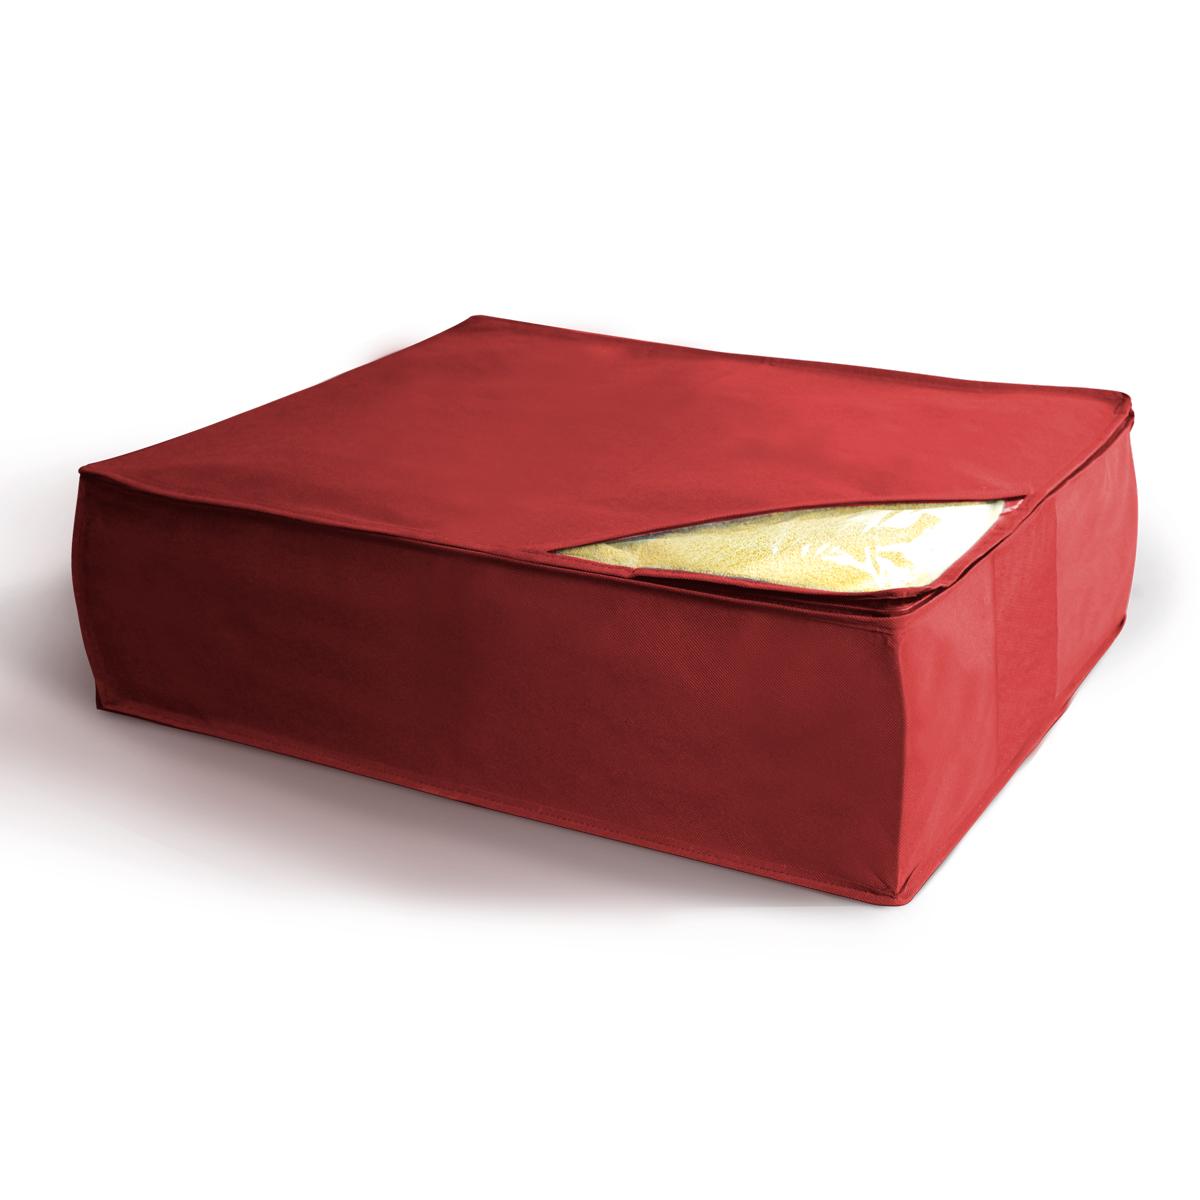 Кофр для хранения Miolla, цвет: бордовый, 50 х 58 х 19 смCHL-5-2Кофр для хранения одеял, подушек и пледов 50 x 58 x 19 см бордовый